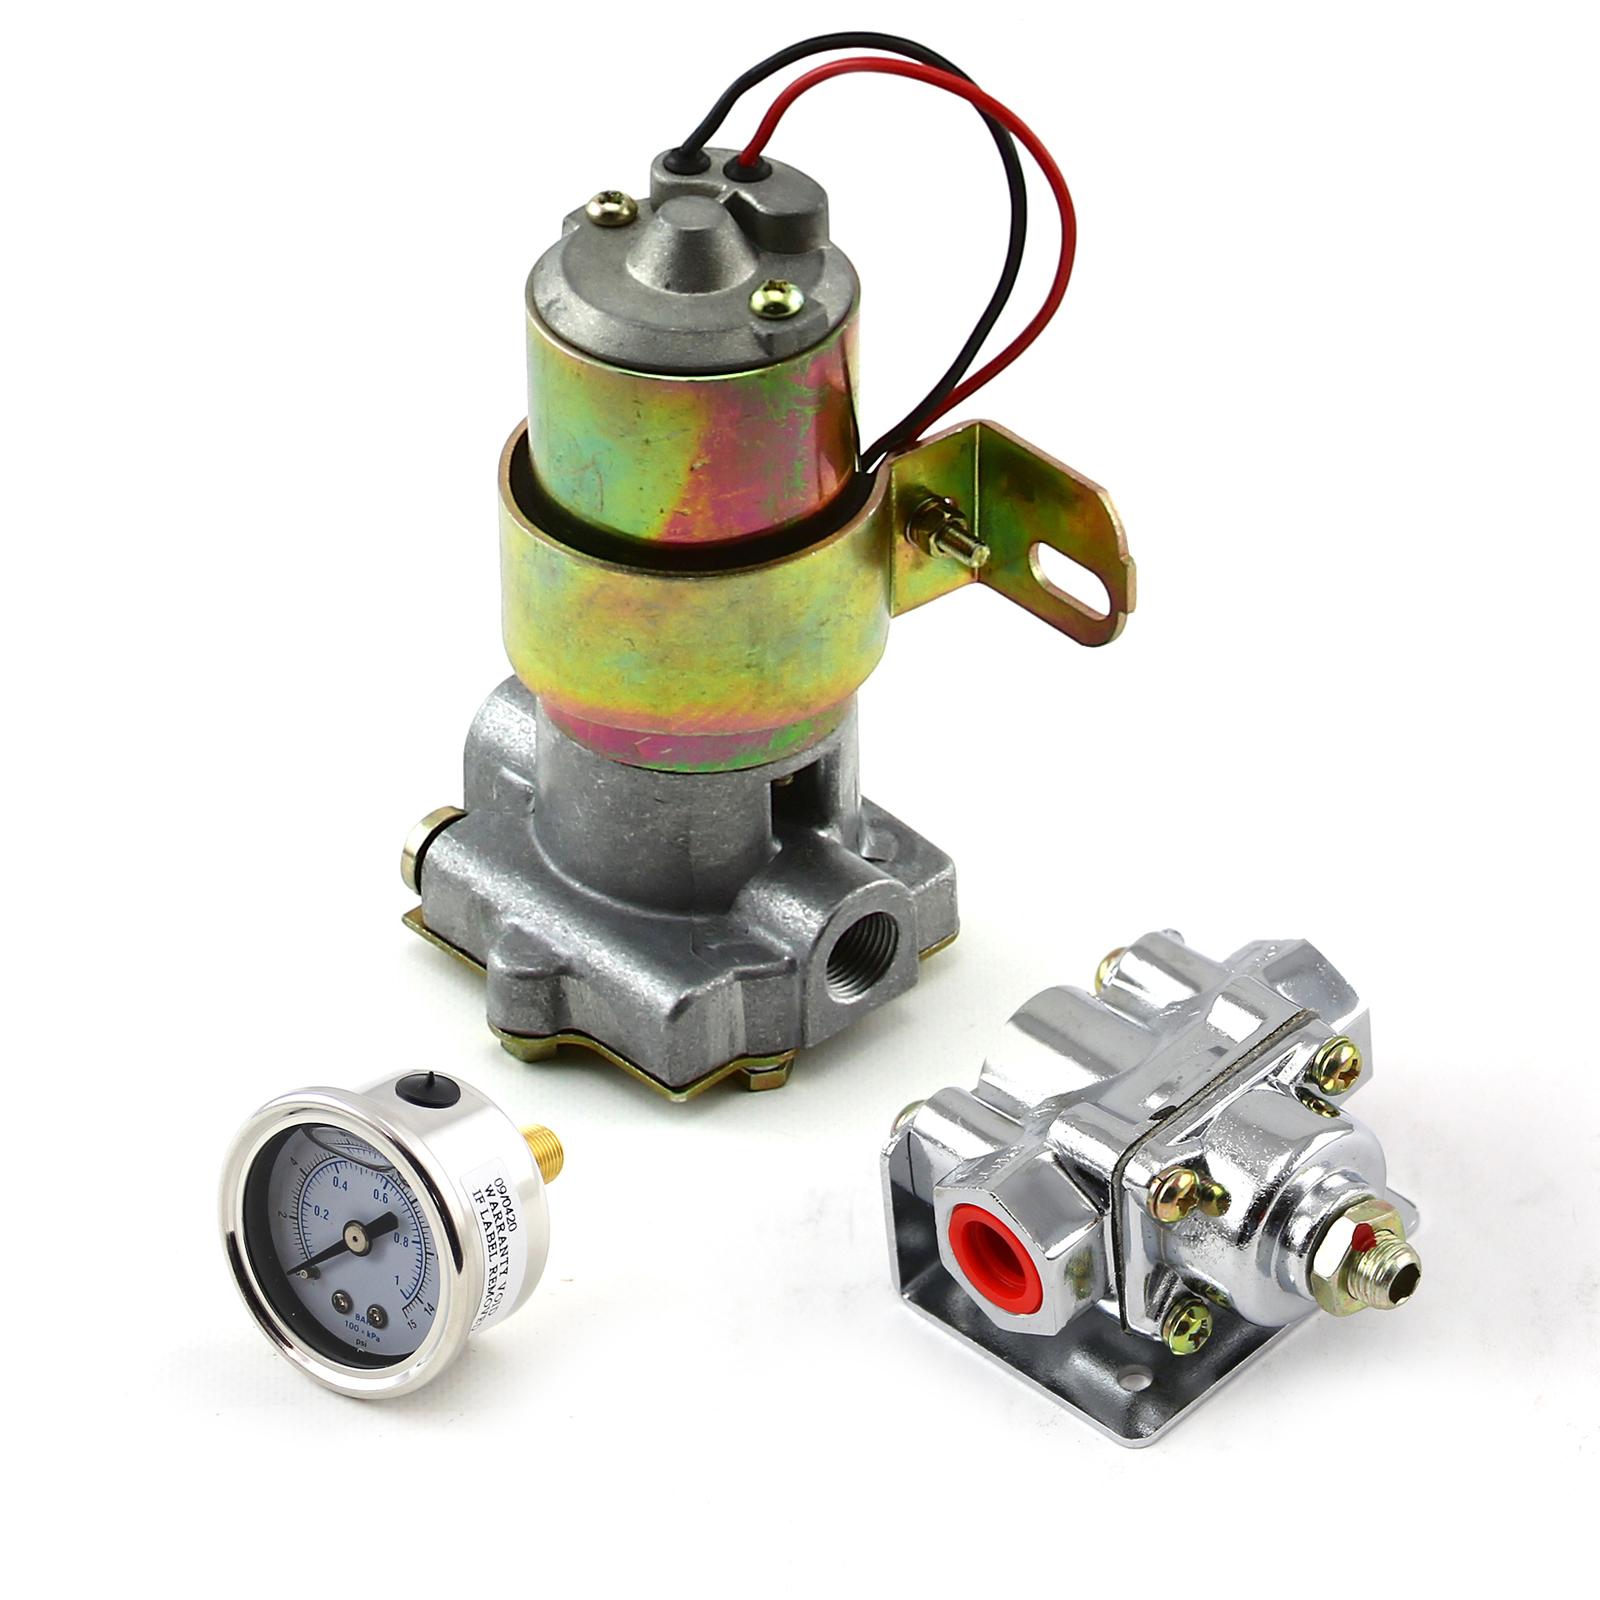 140 Gph Universal Electric Fuel Pump Chrome Regulator & Gauge Combo Kit